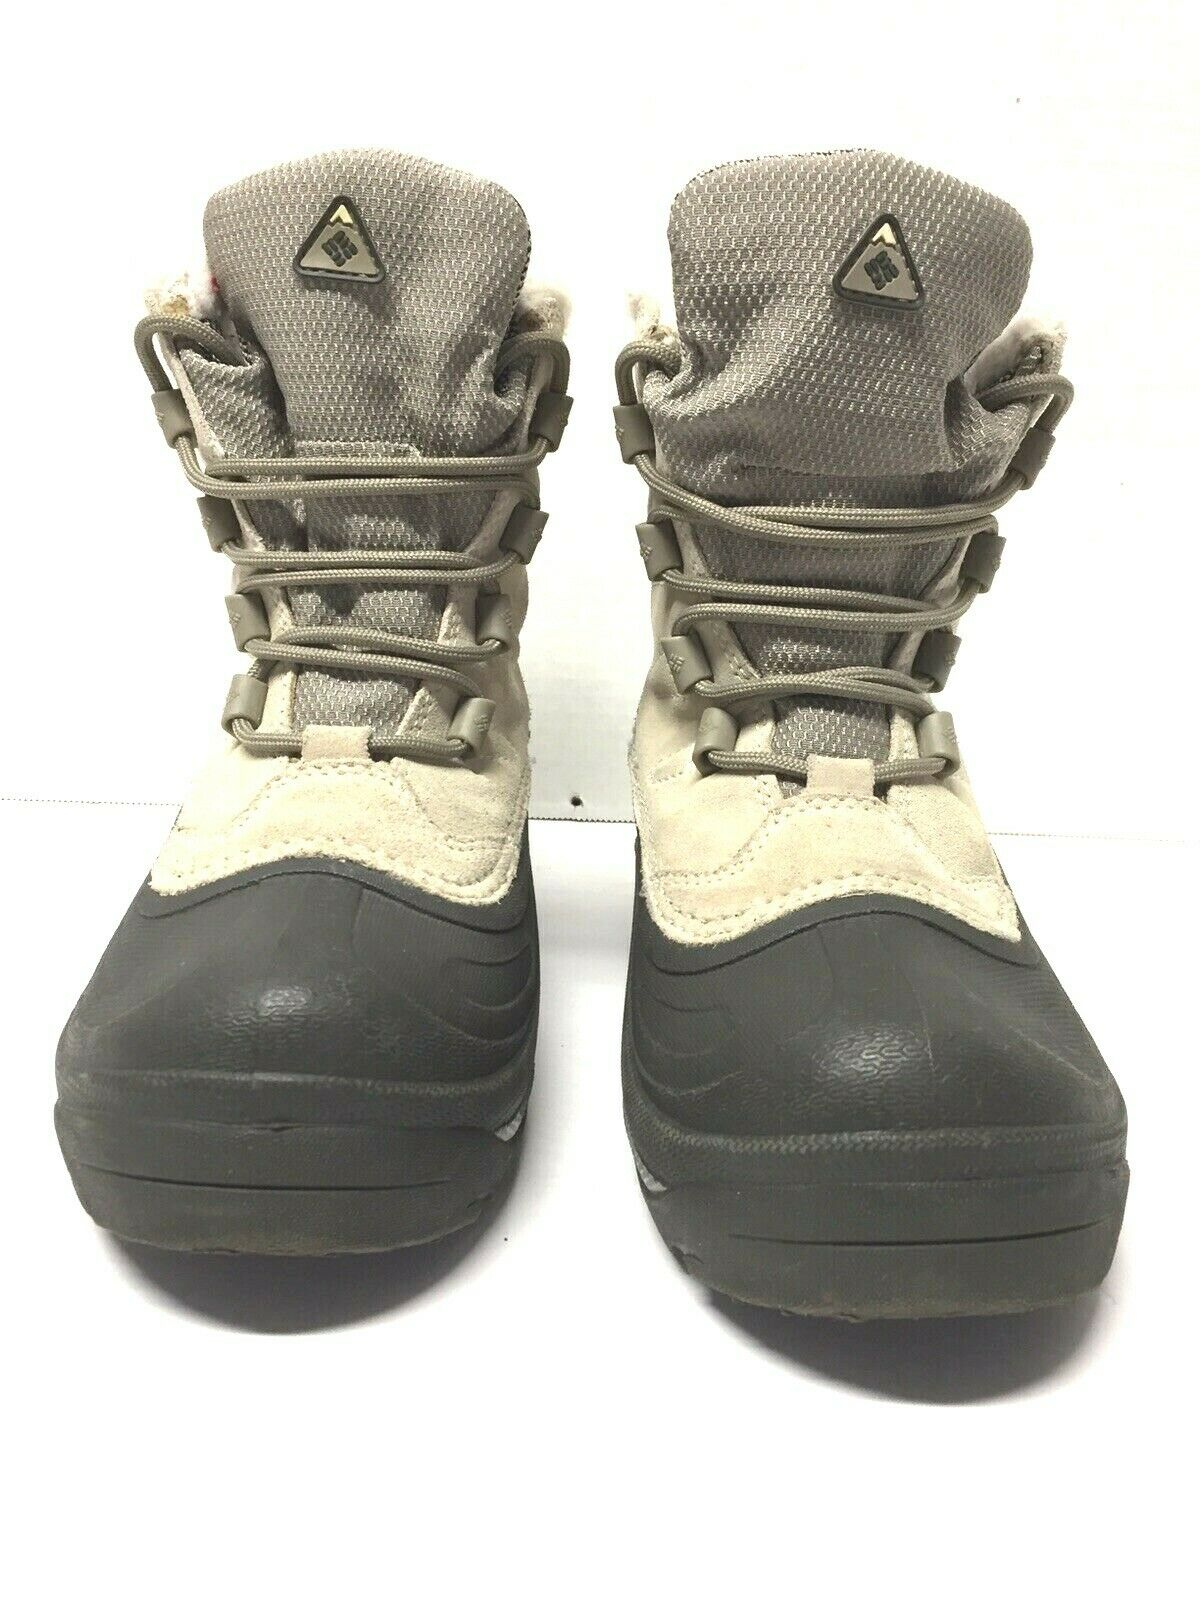 Columbia Cascadian Summette BL1222-022 Women Water Resistant Ankle Boot Size 6